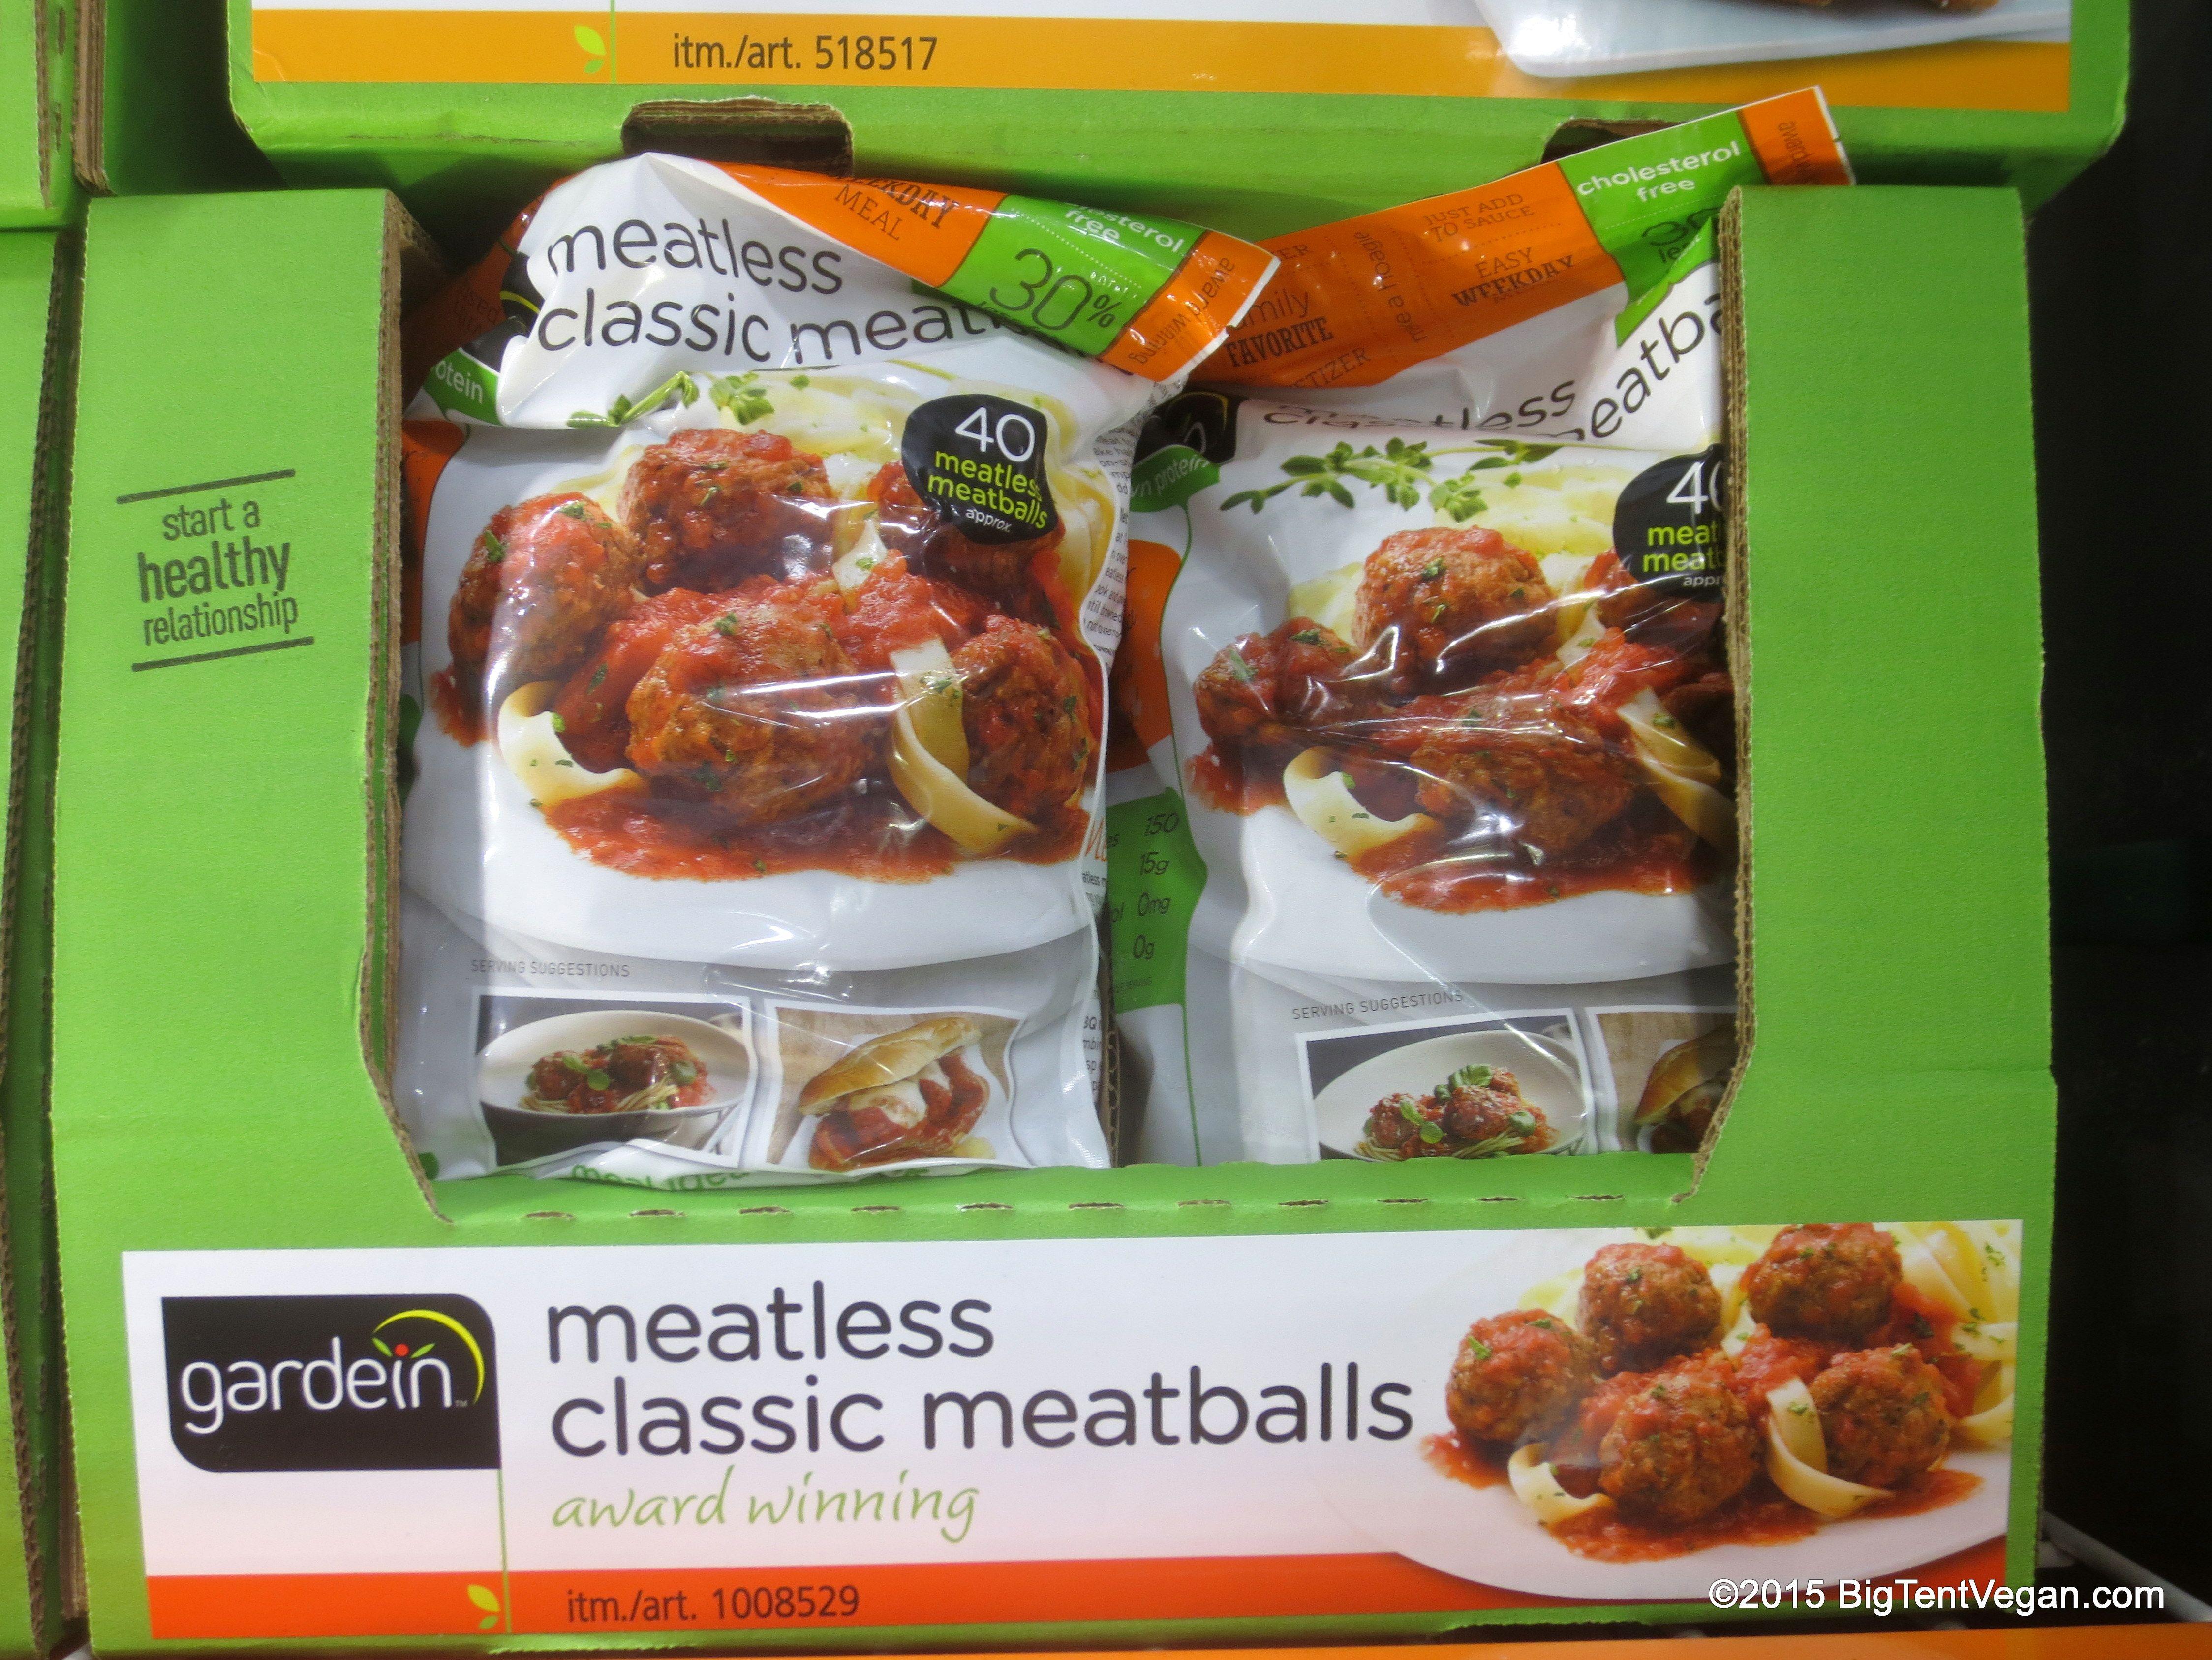 Gardein Meatless Classic Meatballs #costco #vegan #gardein | Vegan ...